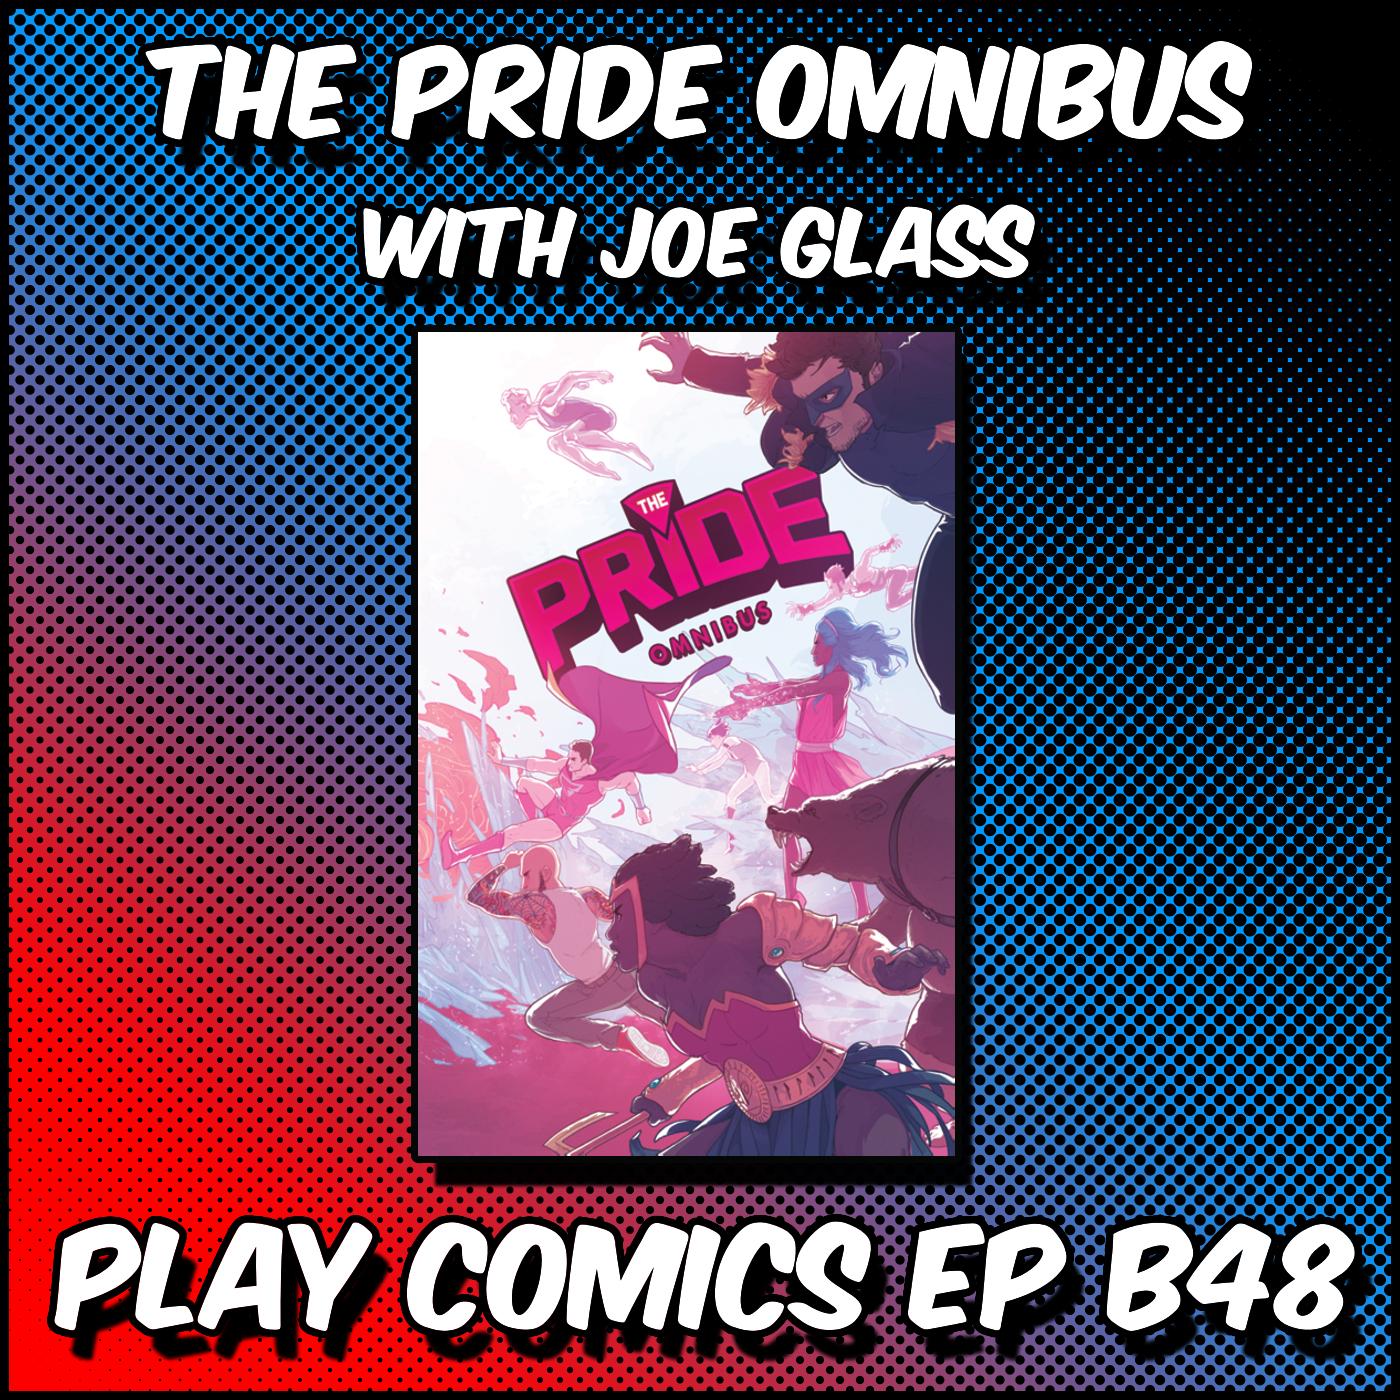 The Pride Omnibus with Joe Glass